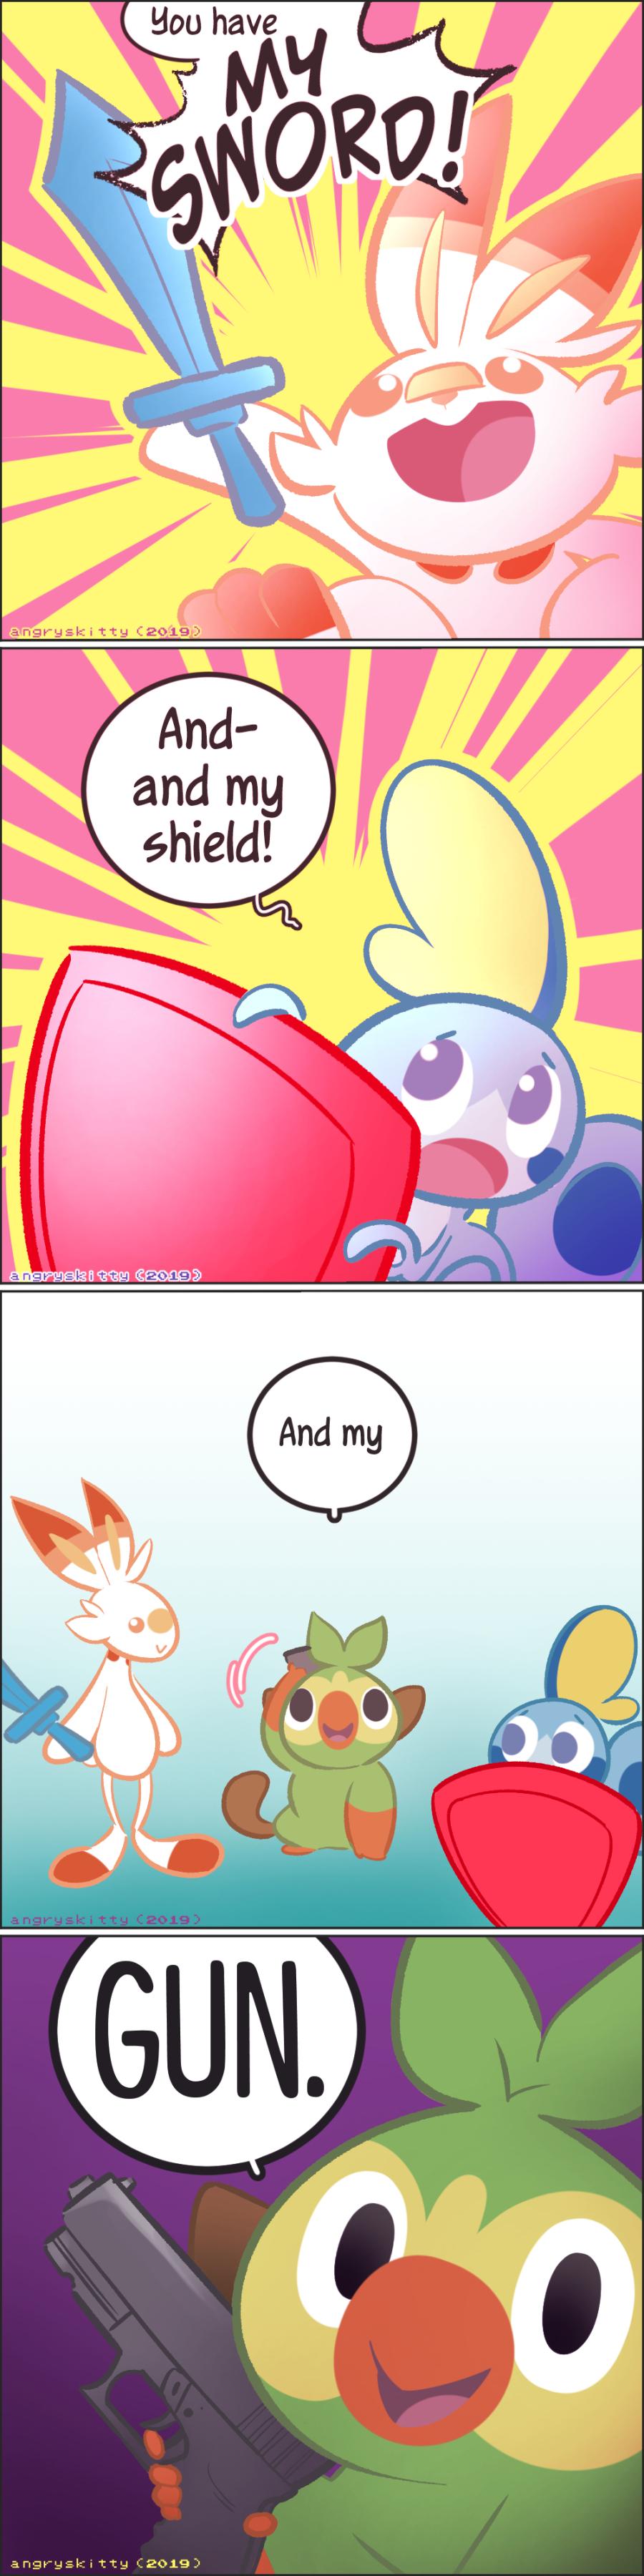 Pokemon Sword And Shield By Angryskitty On Newgrounds